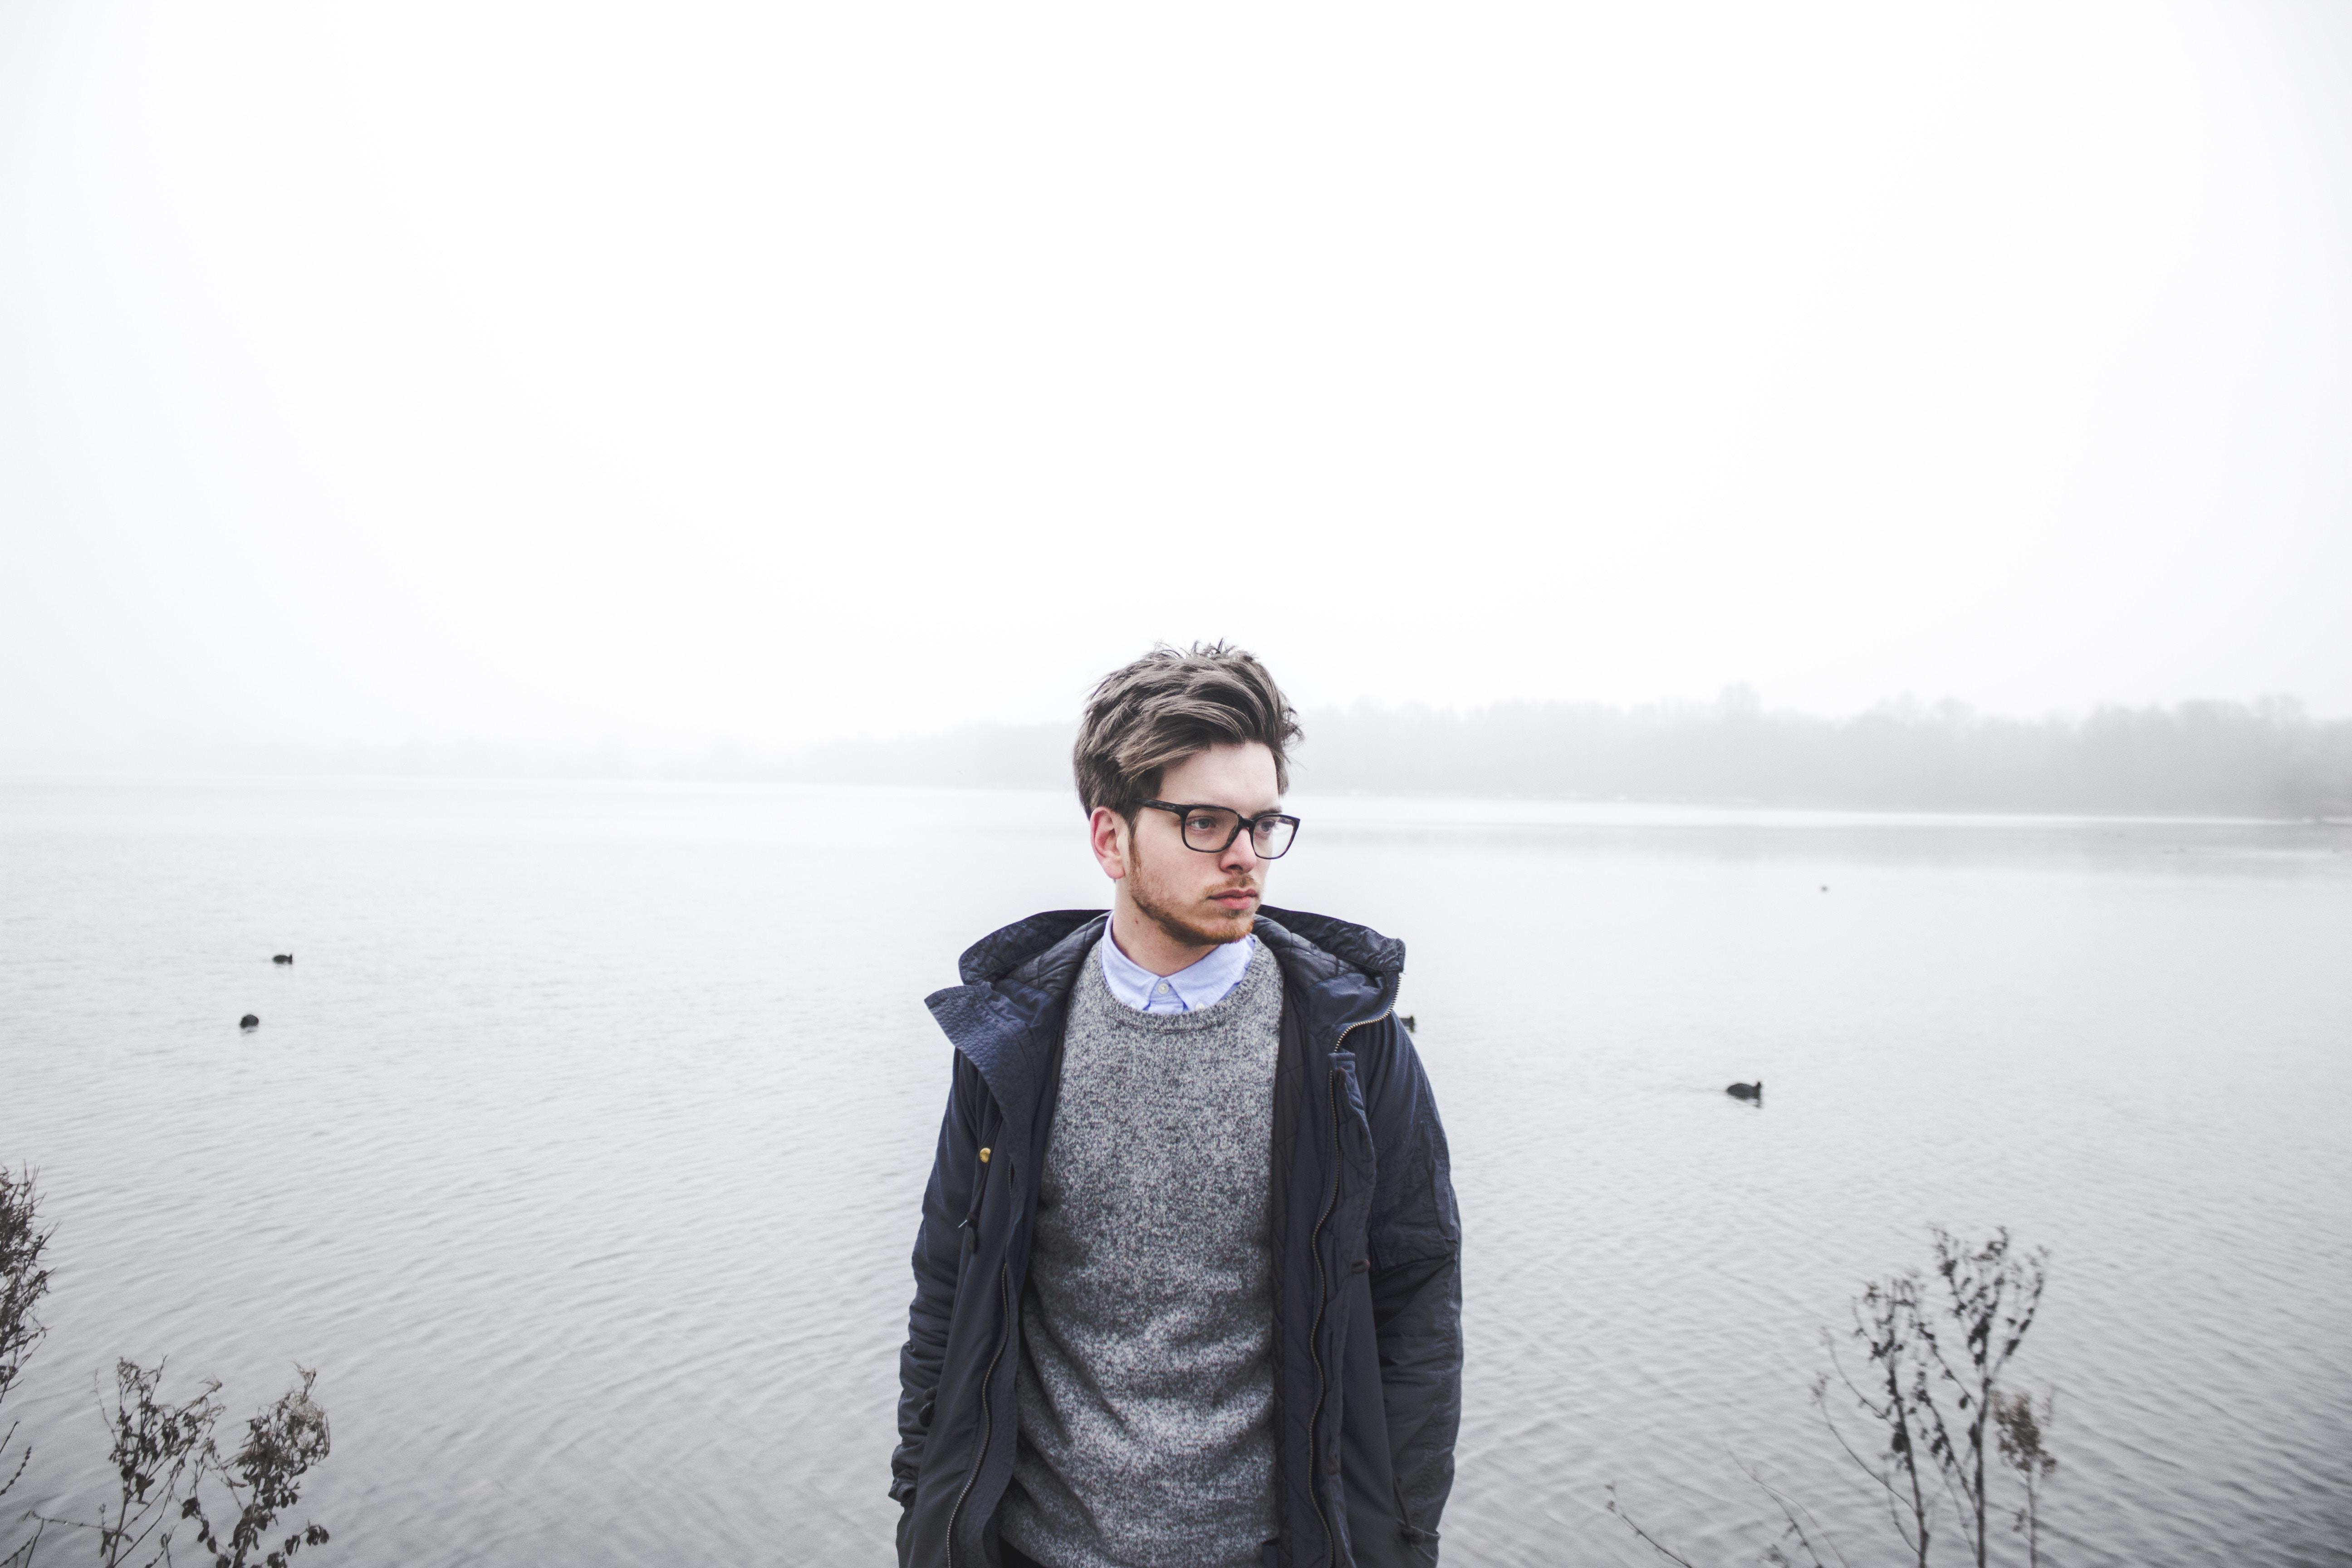 man wearing black jacket standing near body of water